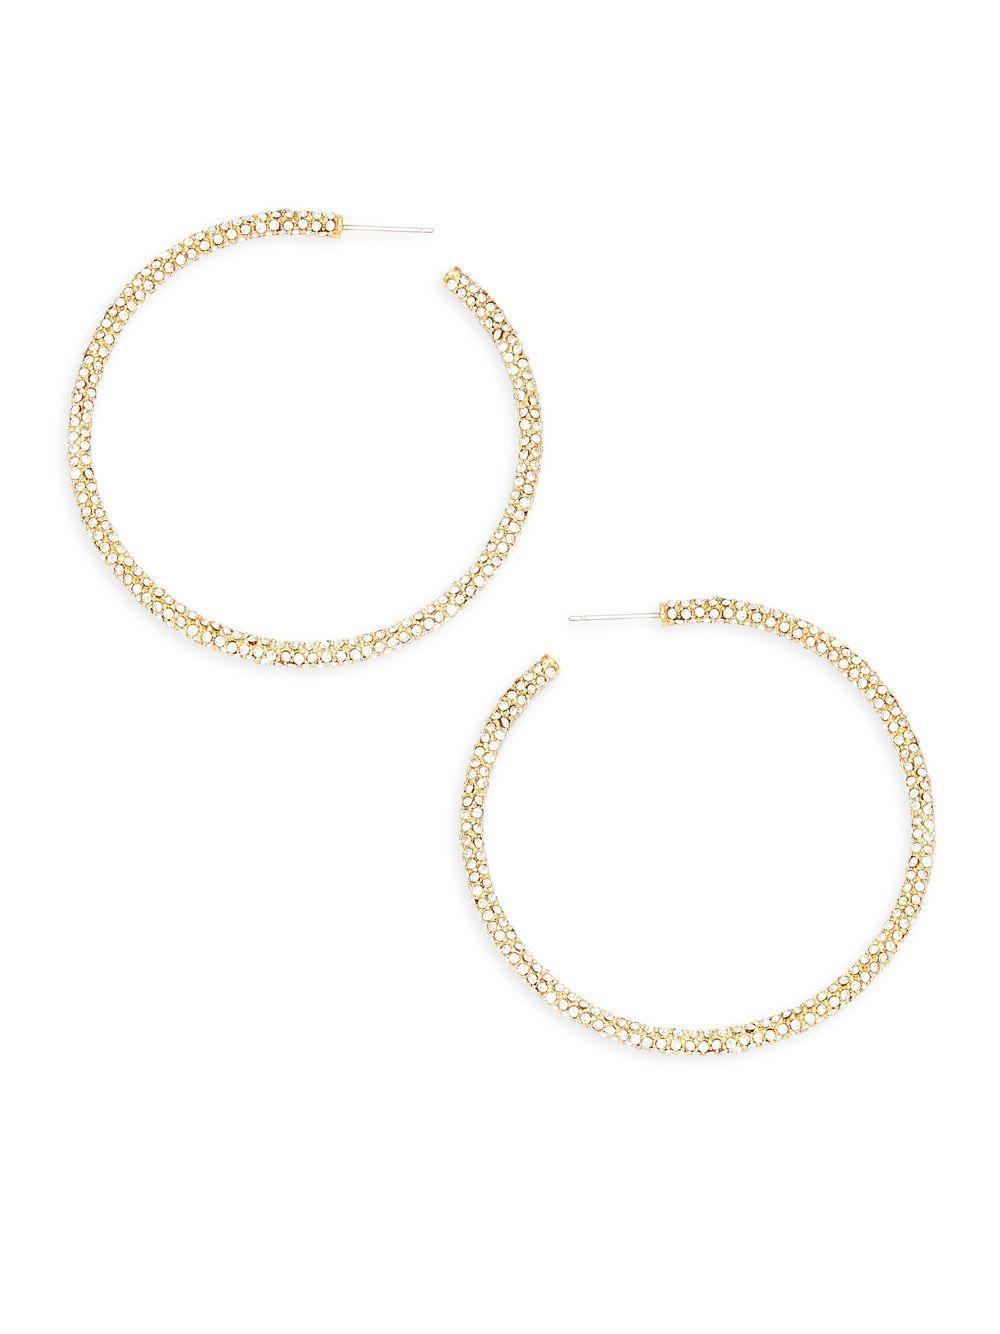 Adriana Orsini Women S Metallic Jumbo Pavé Hoop Earrings